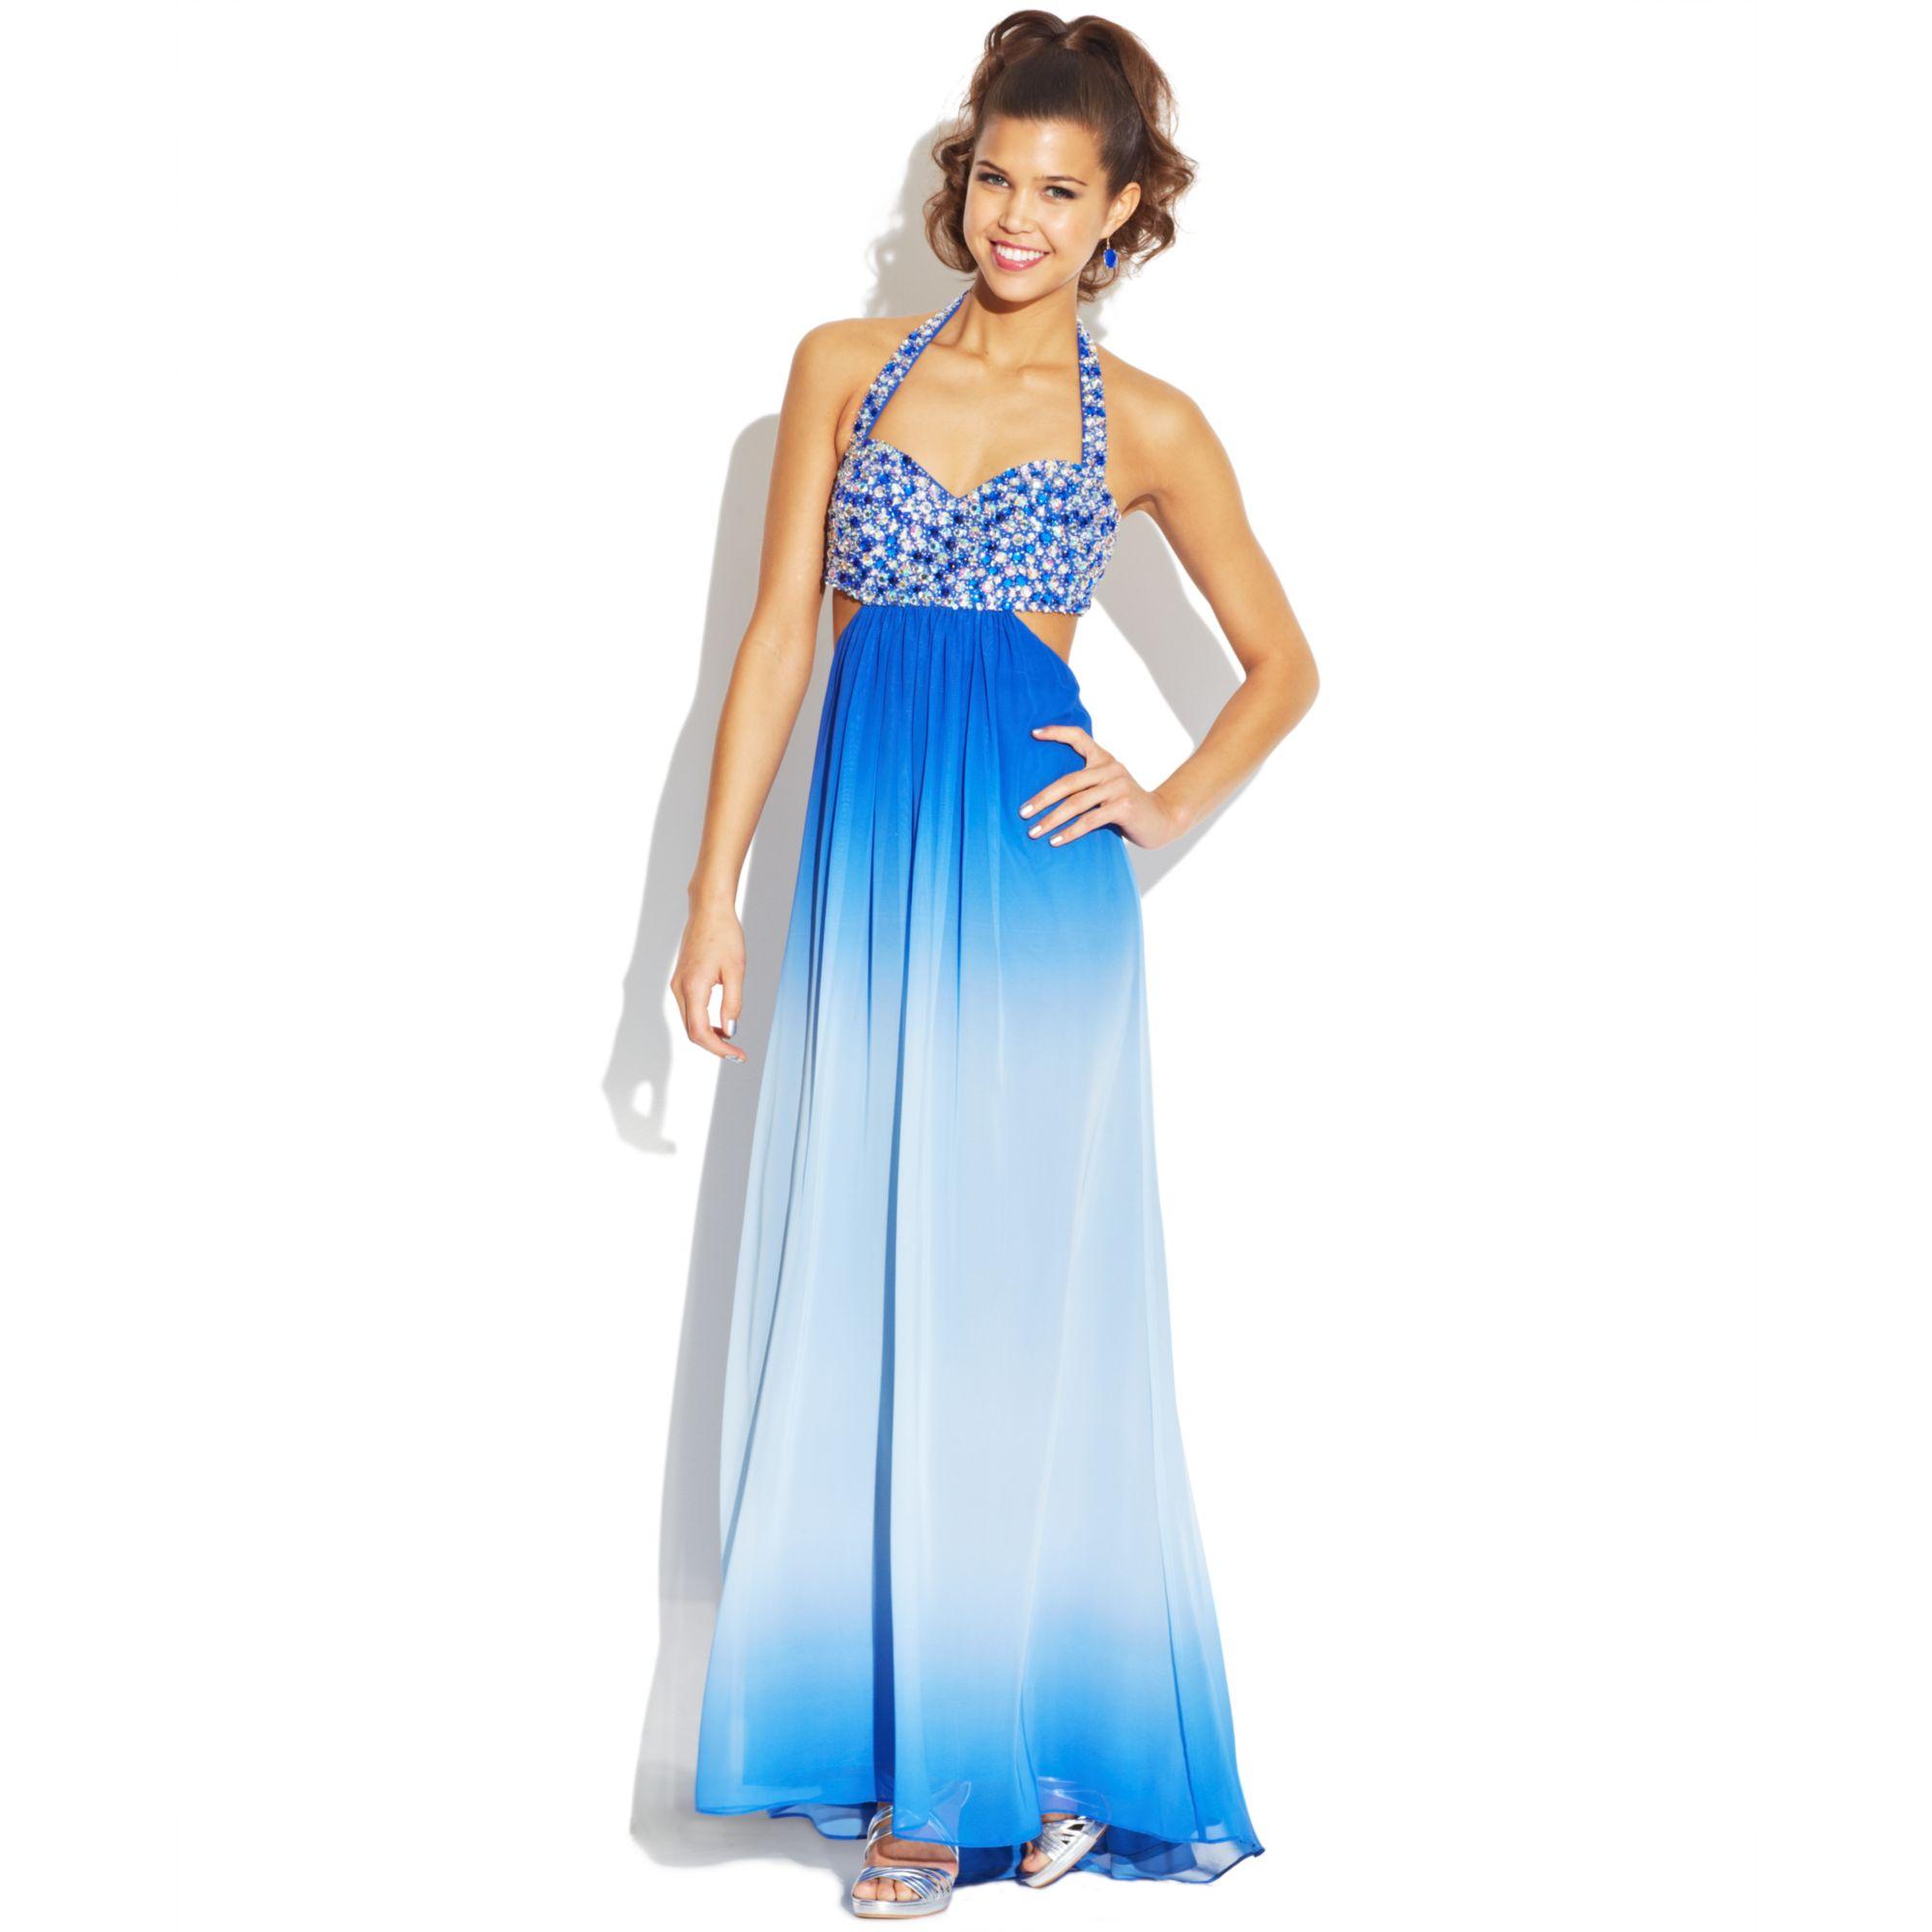 Jump Juniors Ombreprint Halter Dress in Blue   Lyst